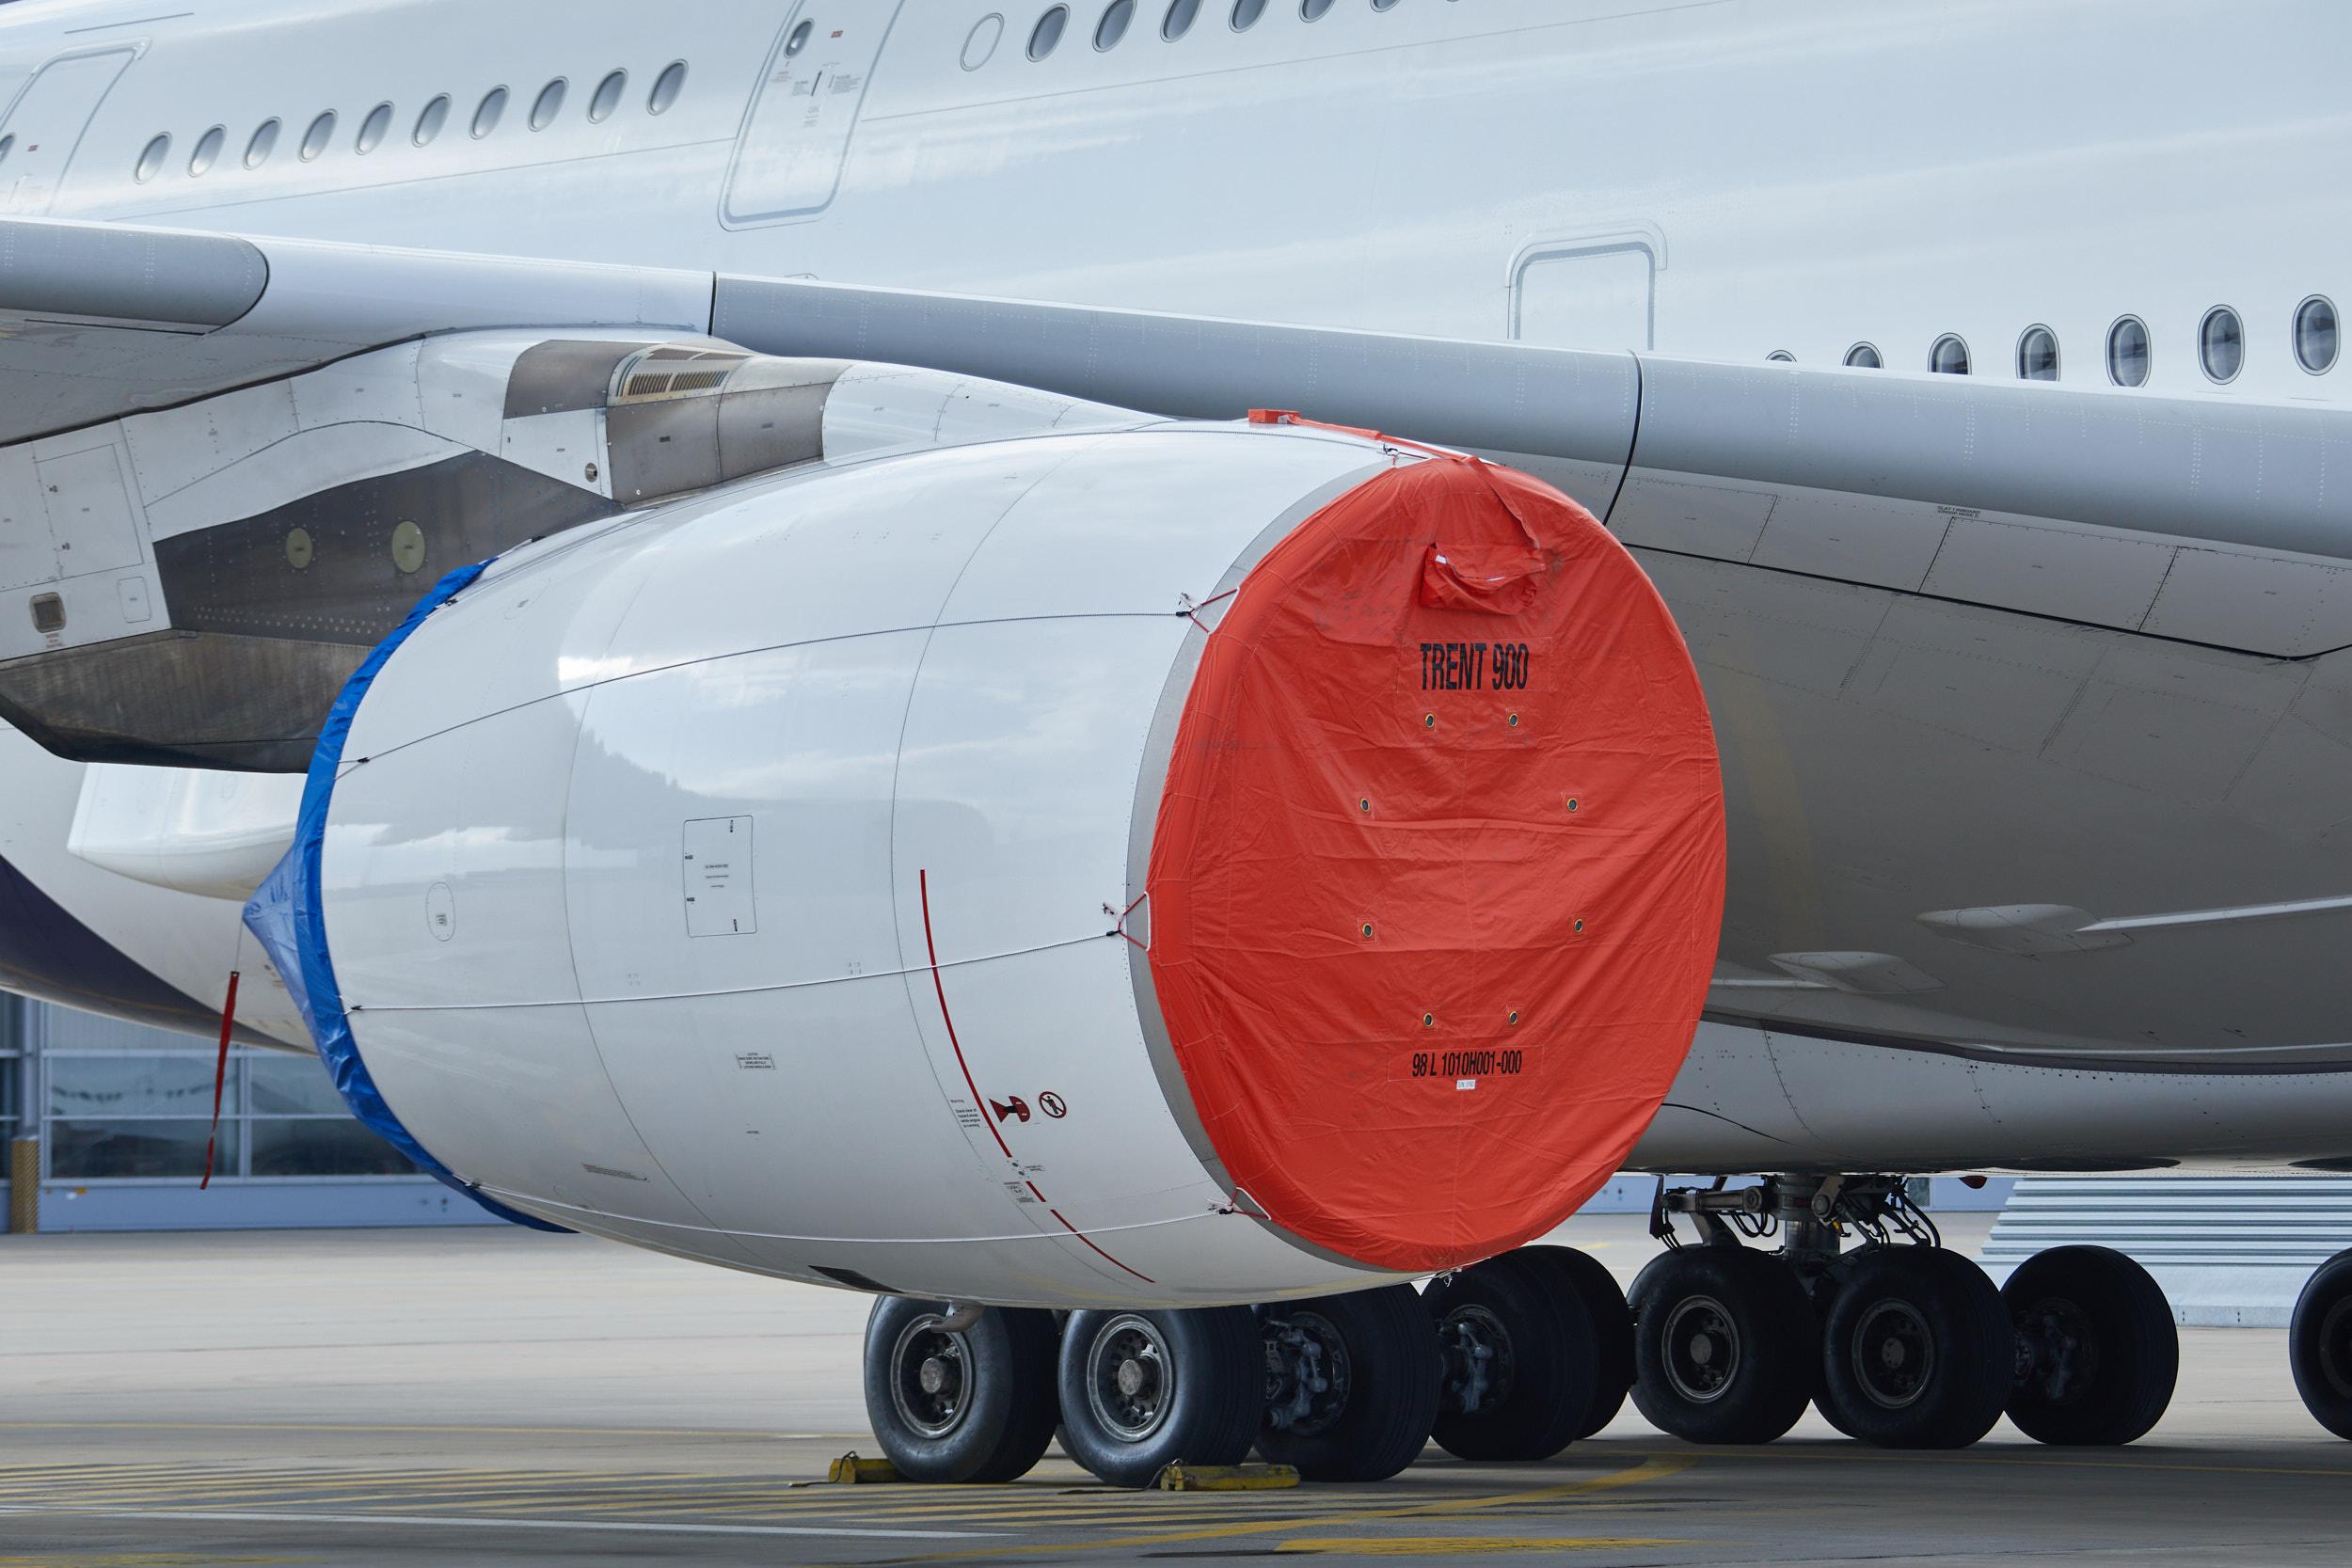 Lufthansa A380 parkeret i Frankfurt Airport. (Foto: Lufthansa | PR)